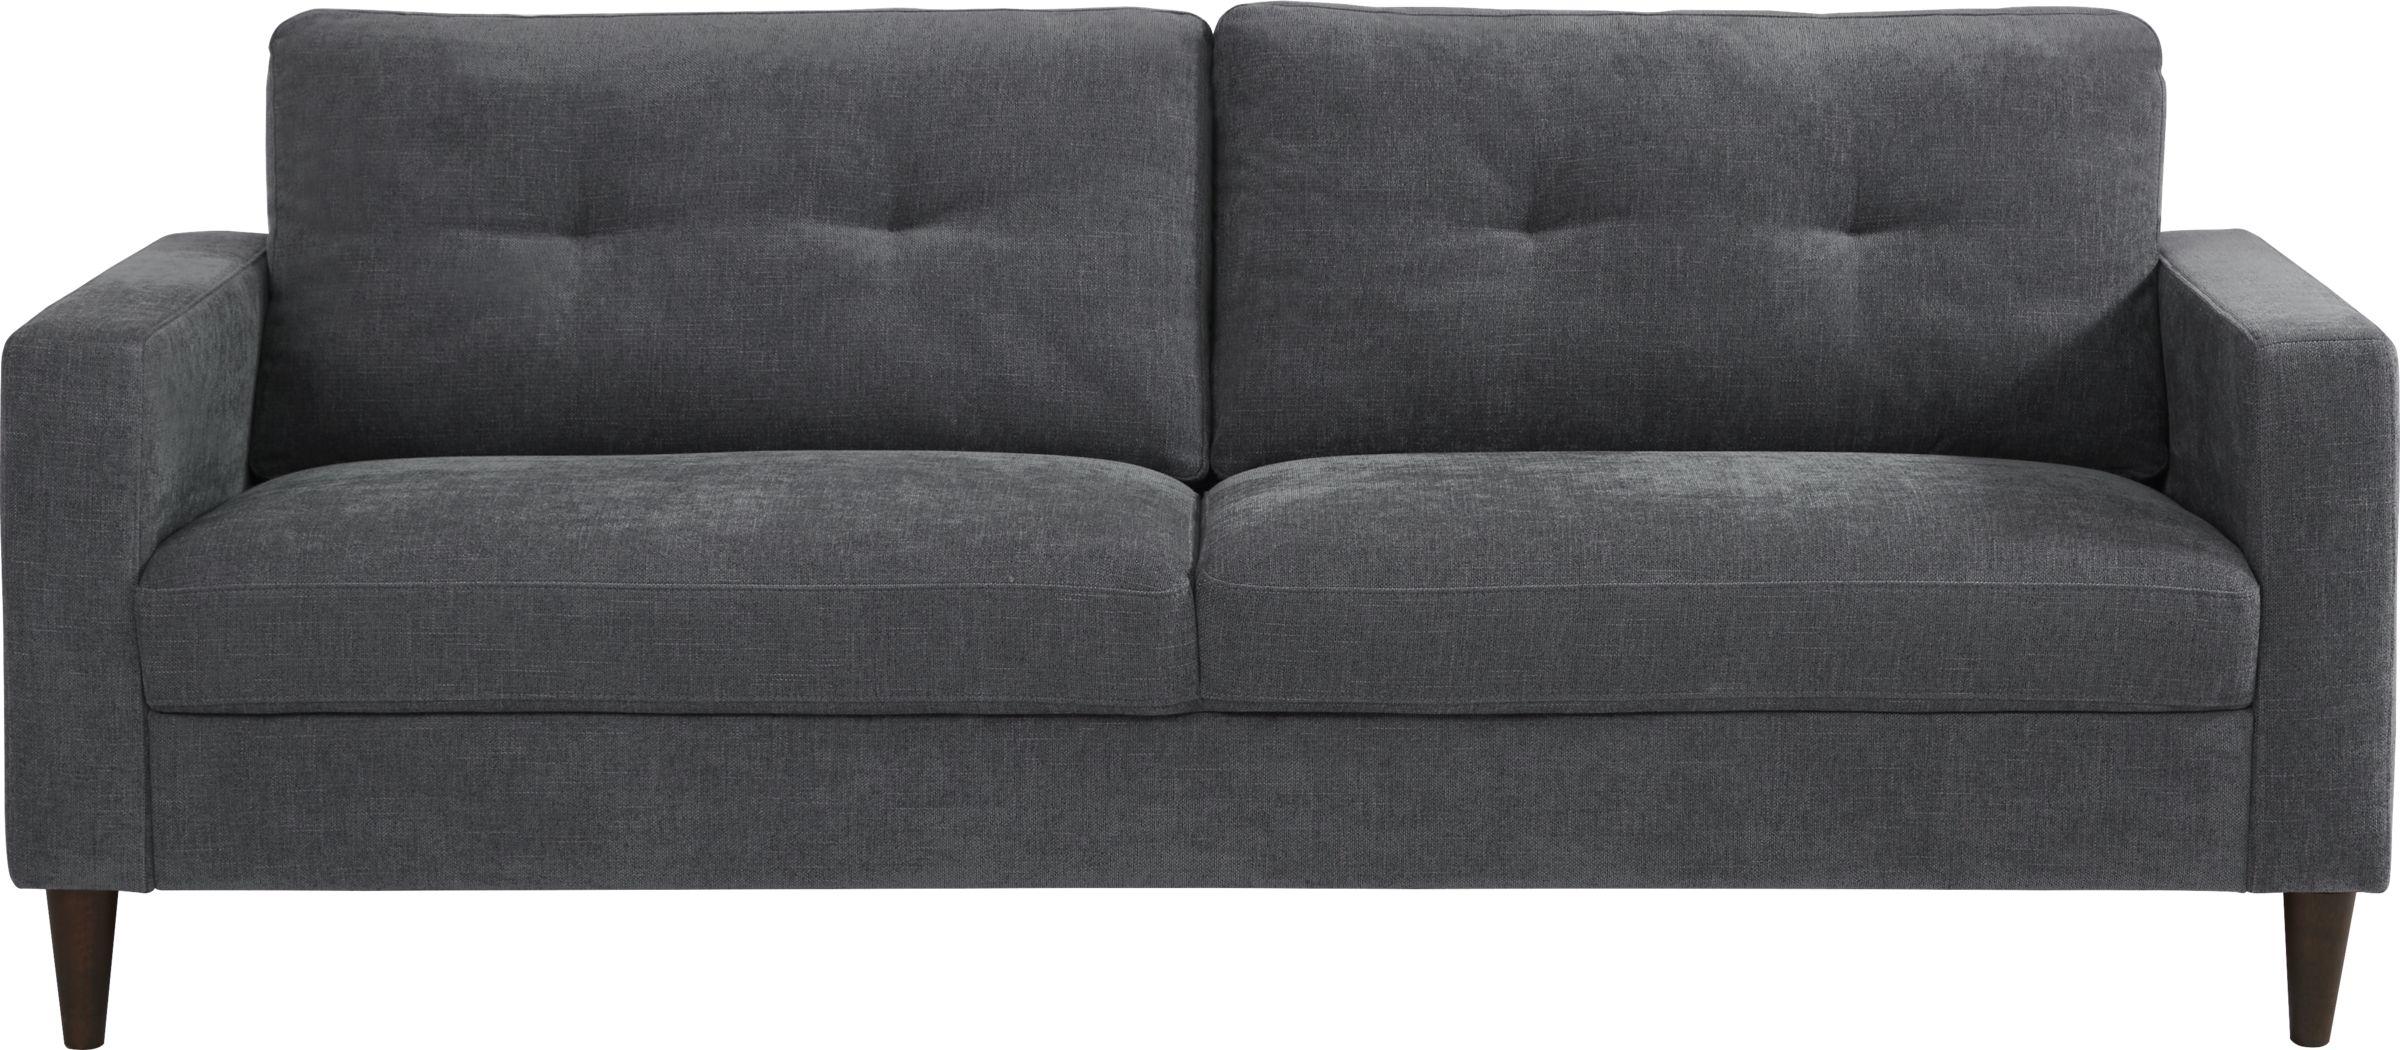 Bonavista Gray Sofa